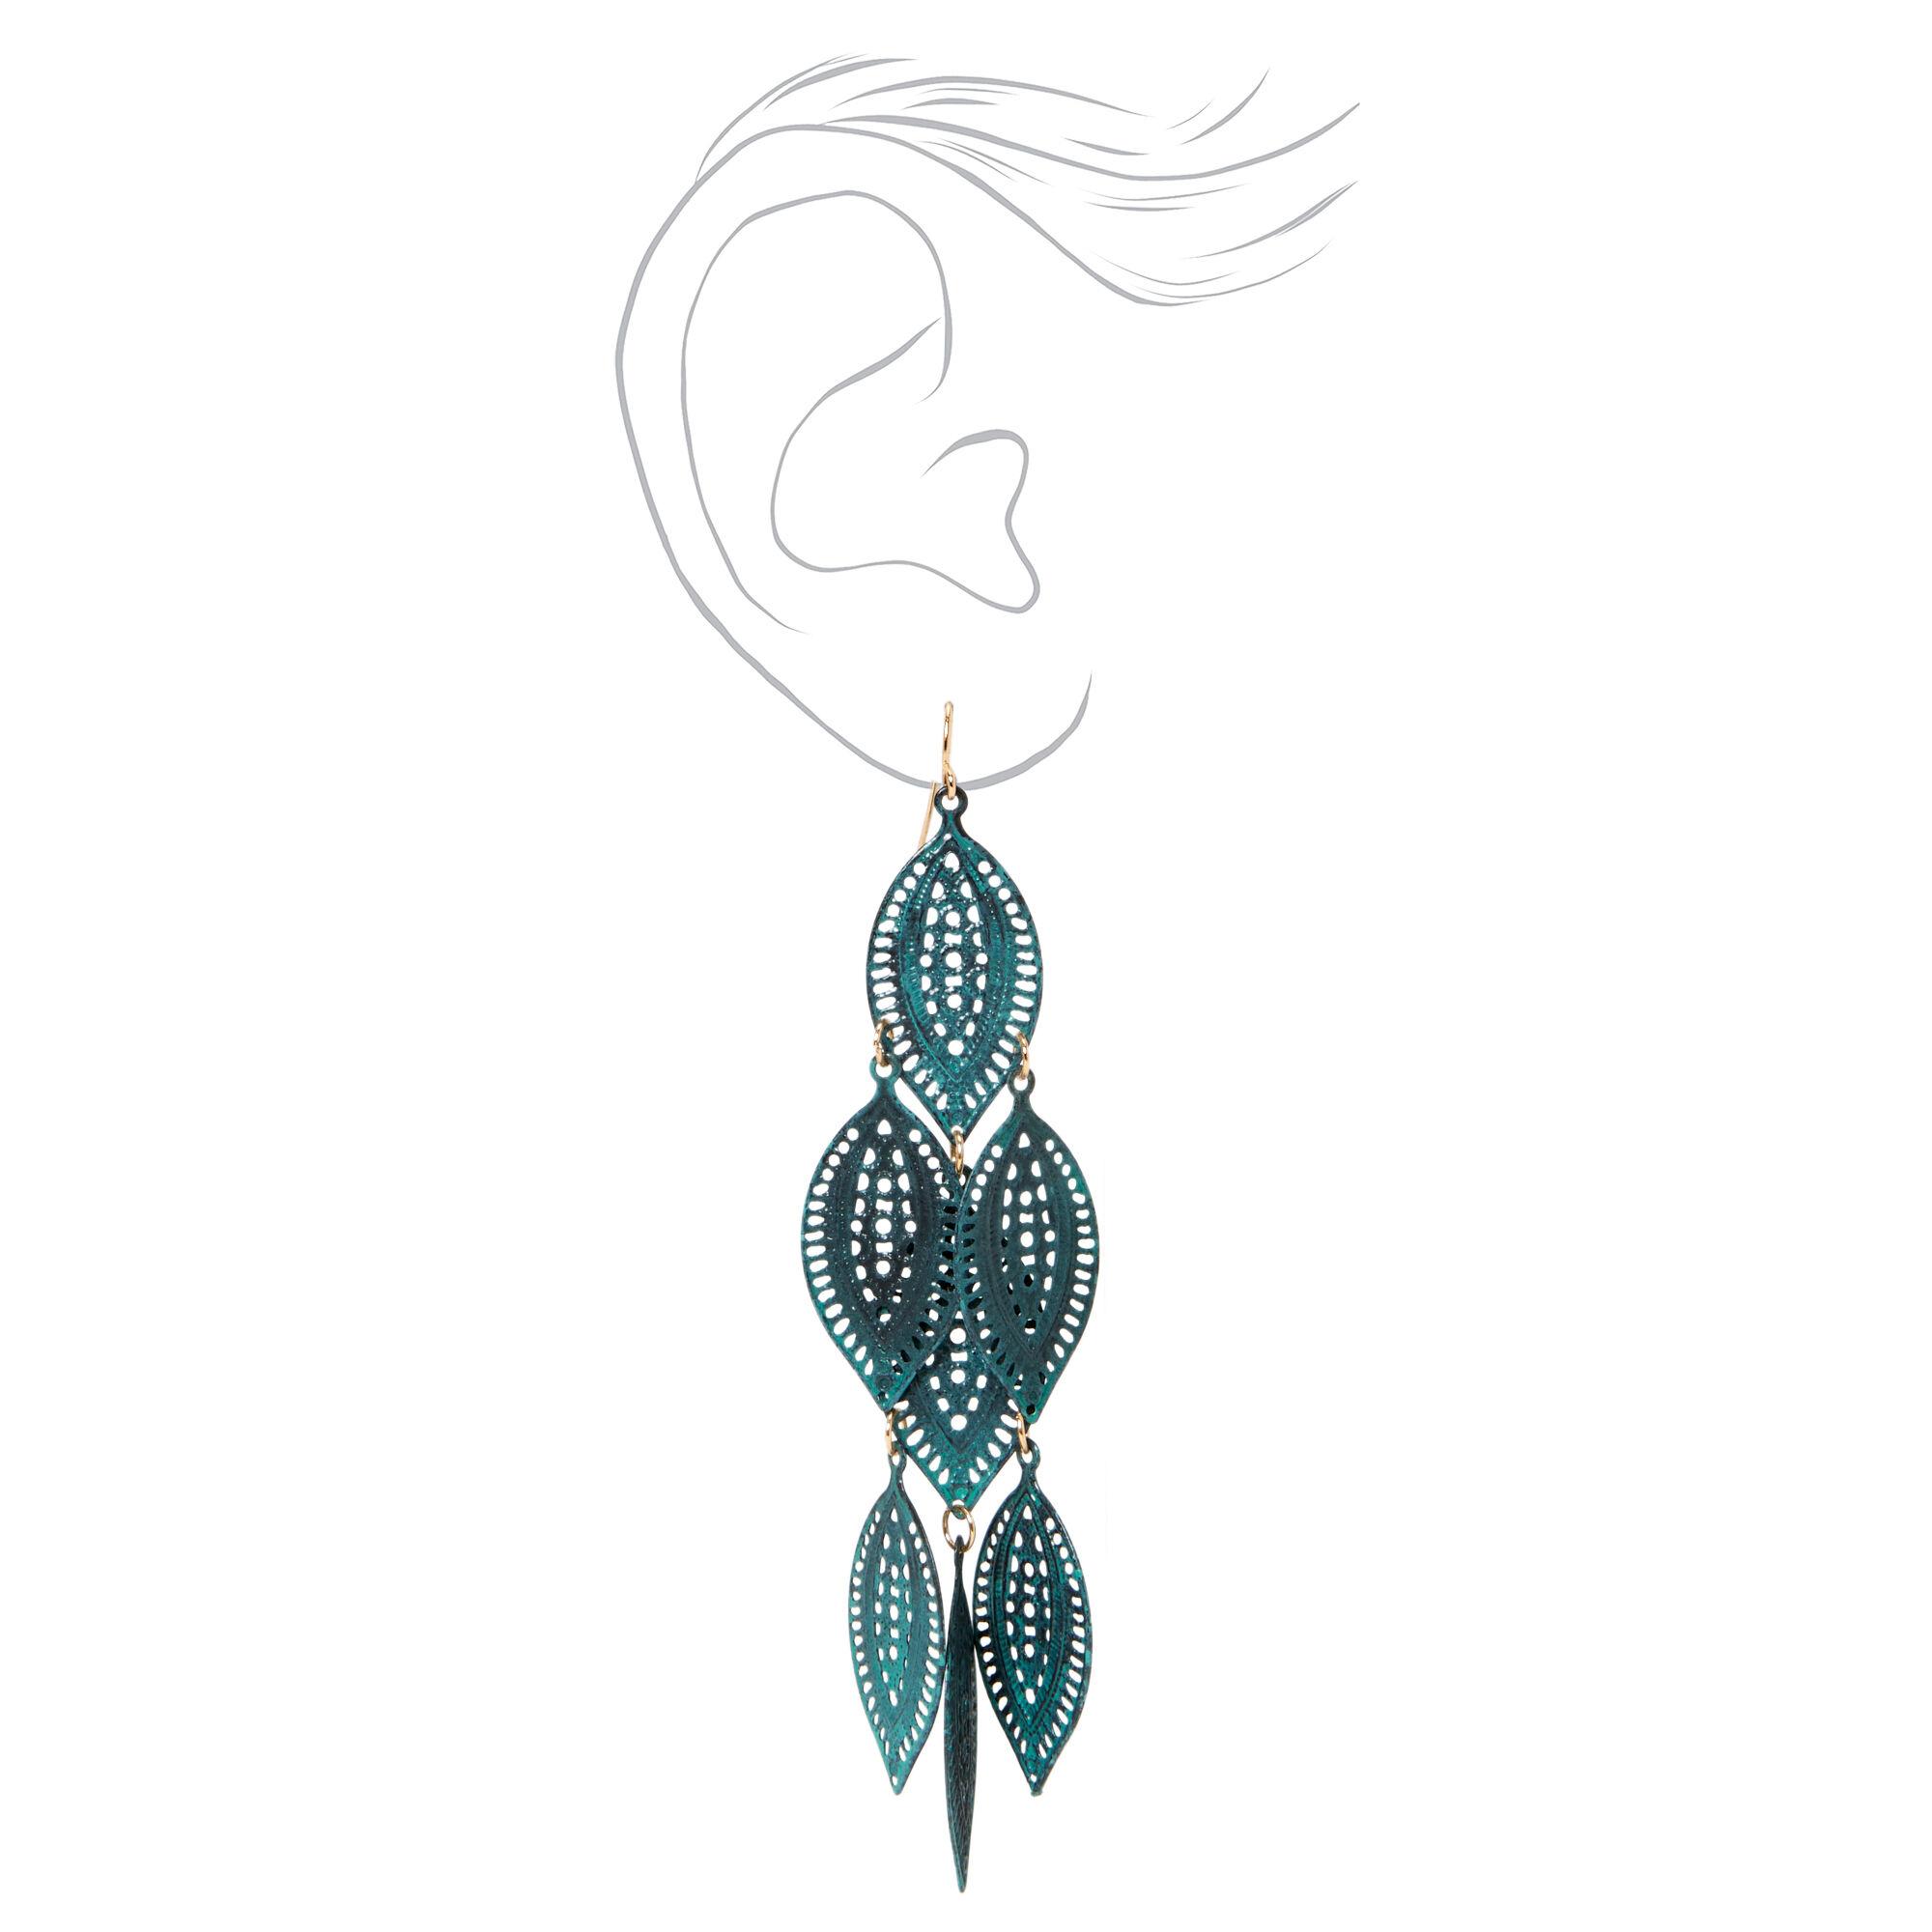 23 Pack Glitter Tip False Nails